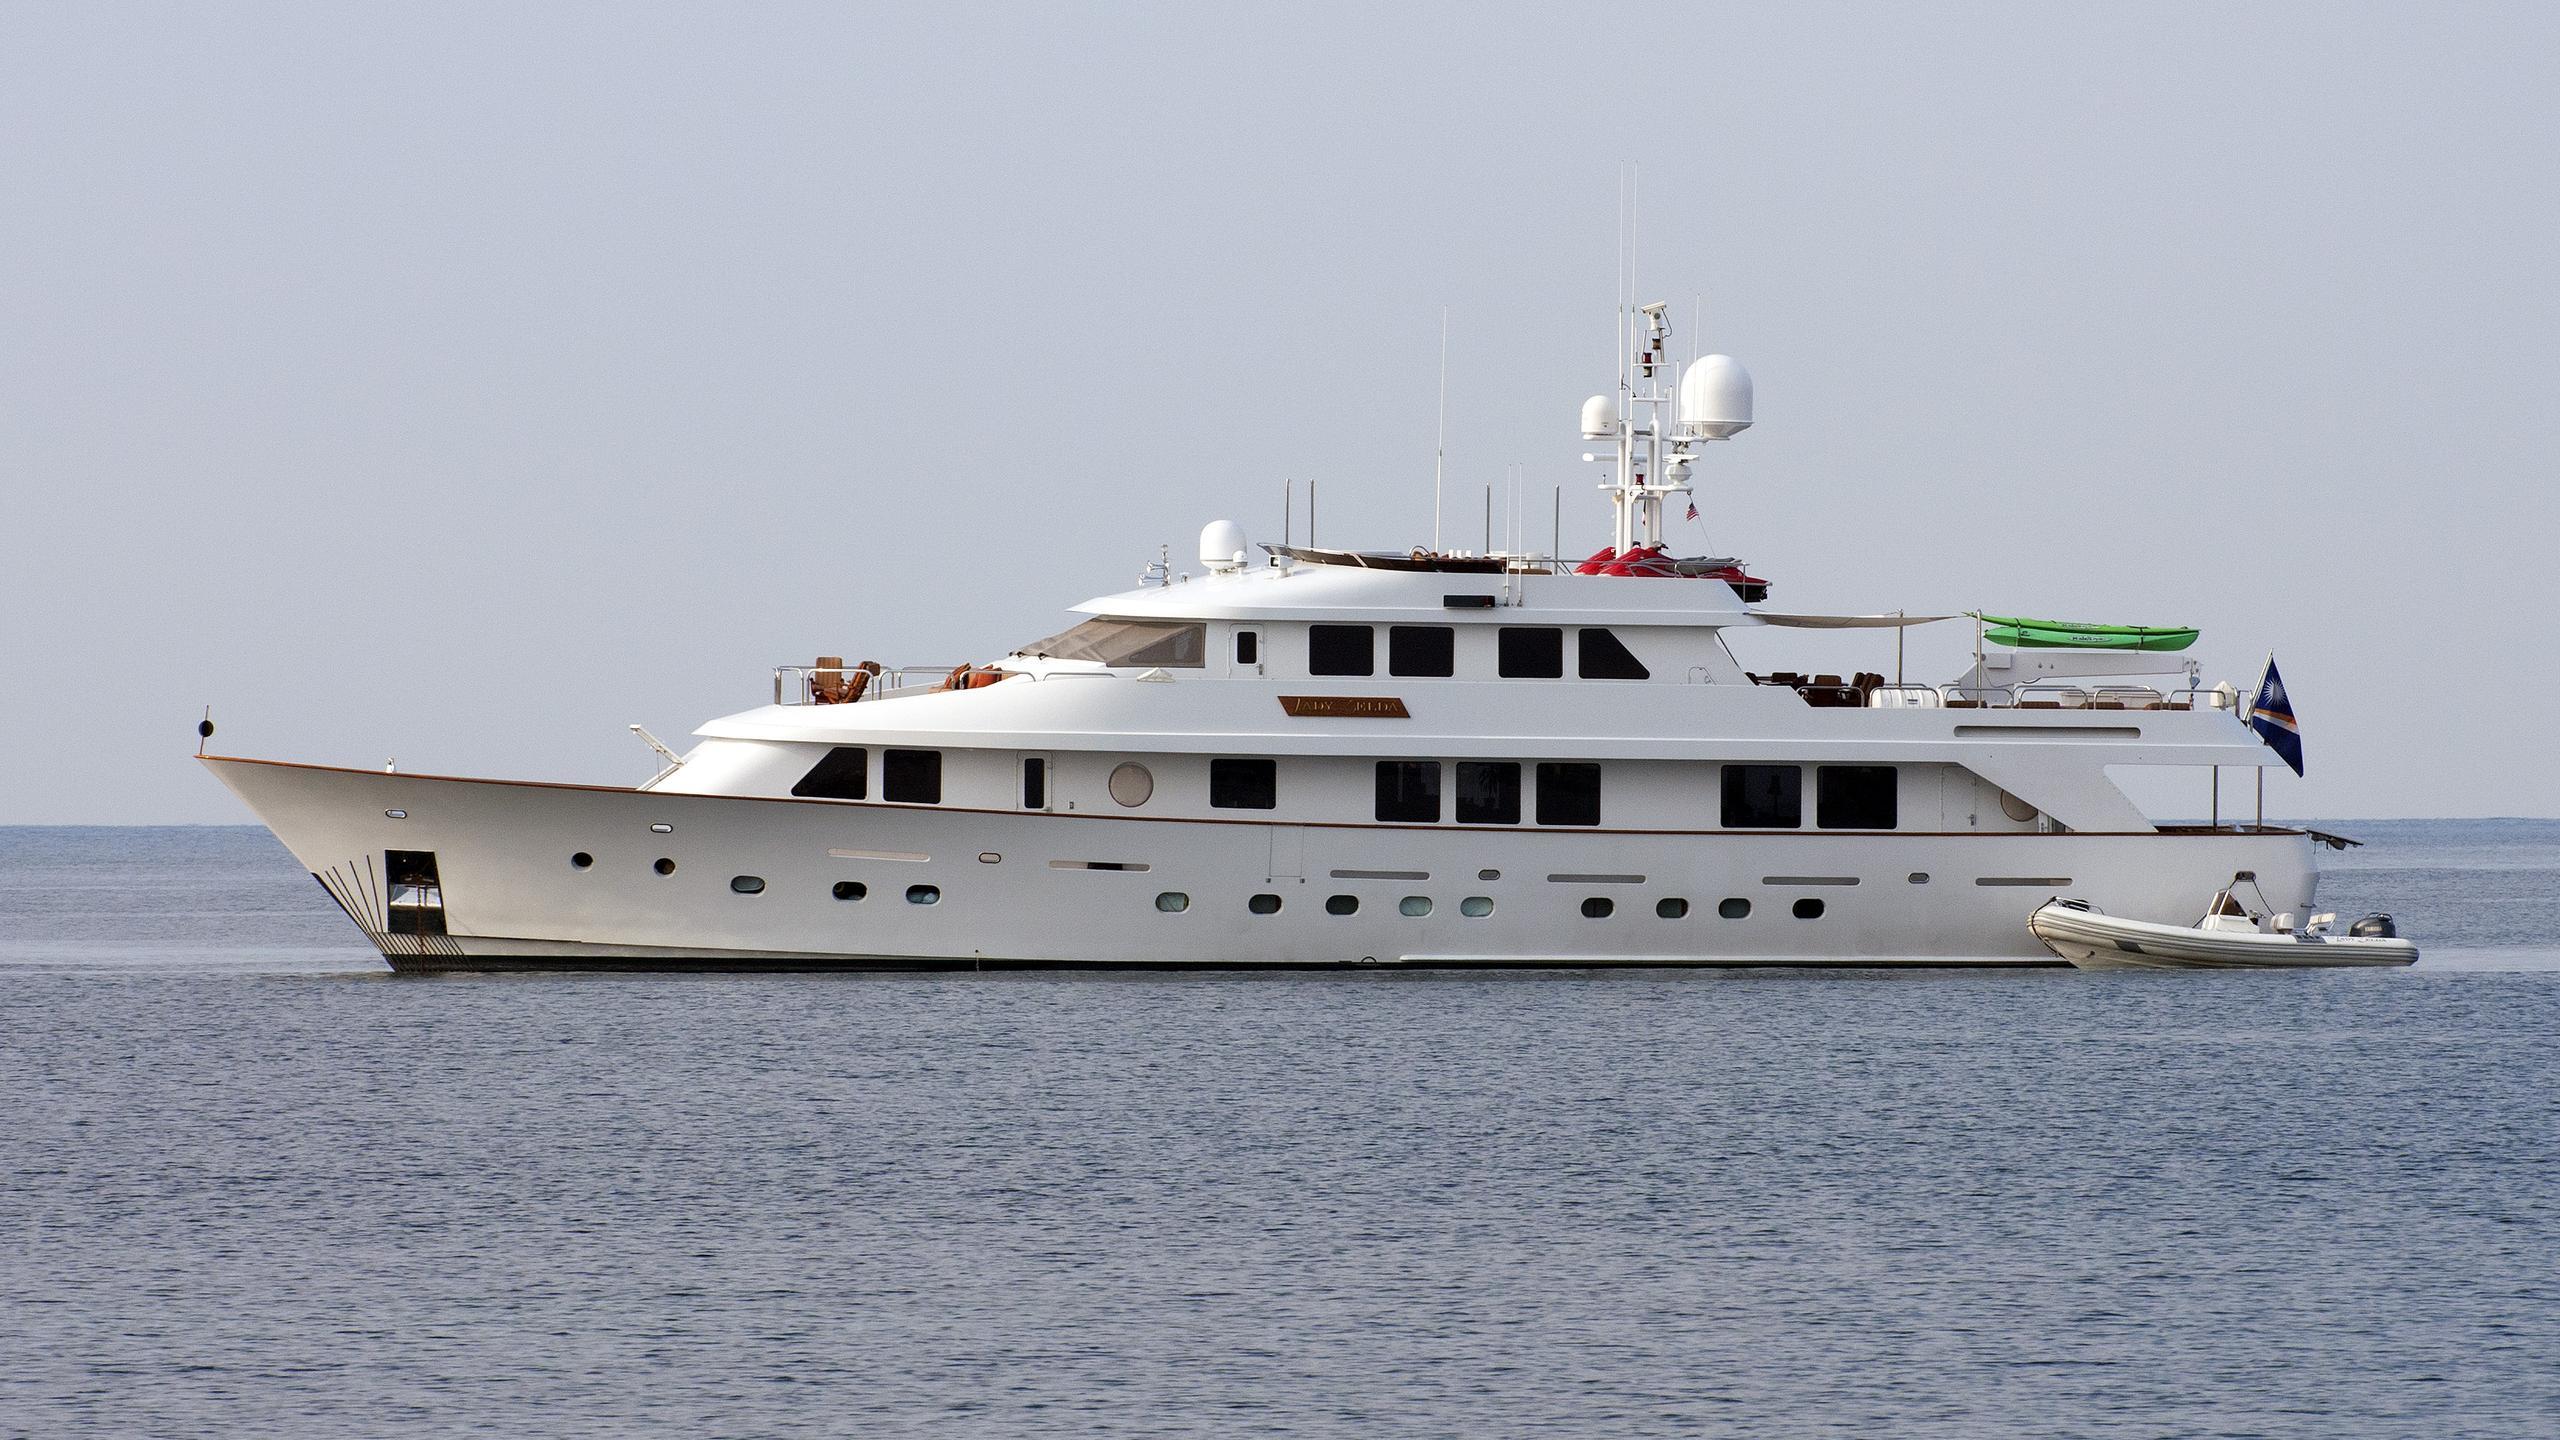 sweet-escape-motor-yacht-christensen-1993-40m-profile